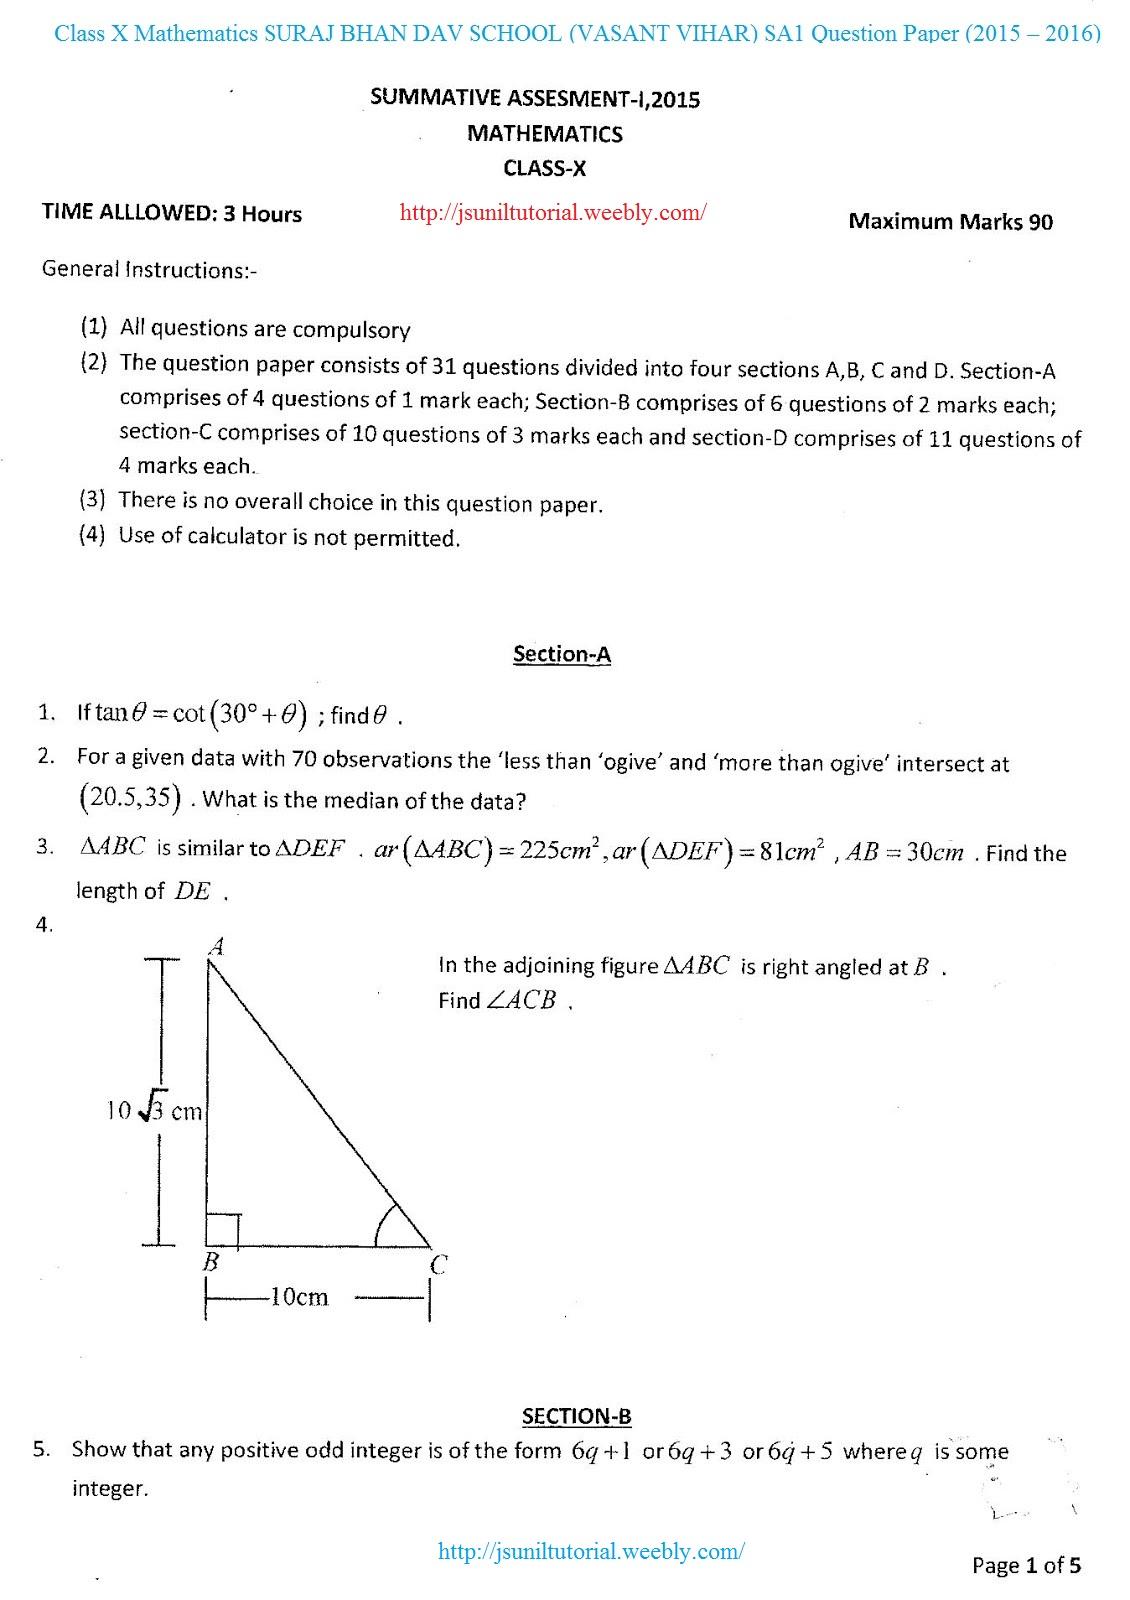 maths question paper cbse Cbse sample papers for class 10 sa1 maths solved 2015-16 set 1  home / cbse / cbse sample papers for class 10 sa1 maths solved 2016-17  (download question paper .